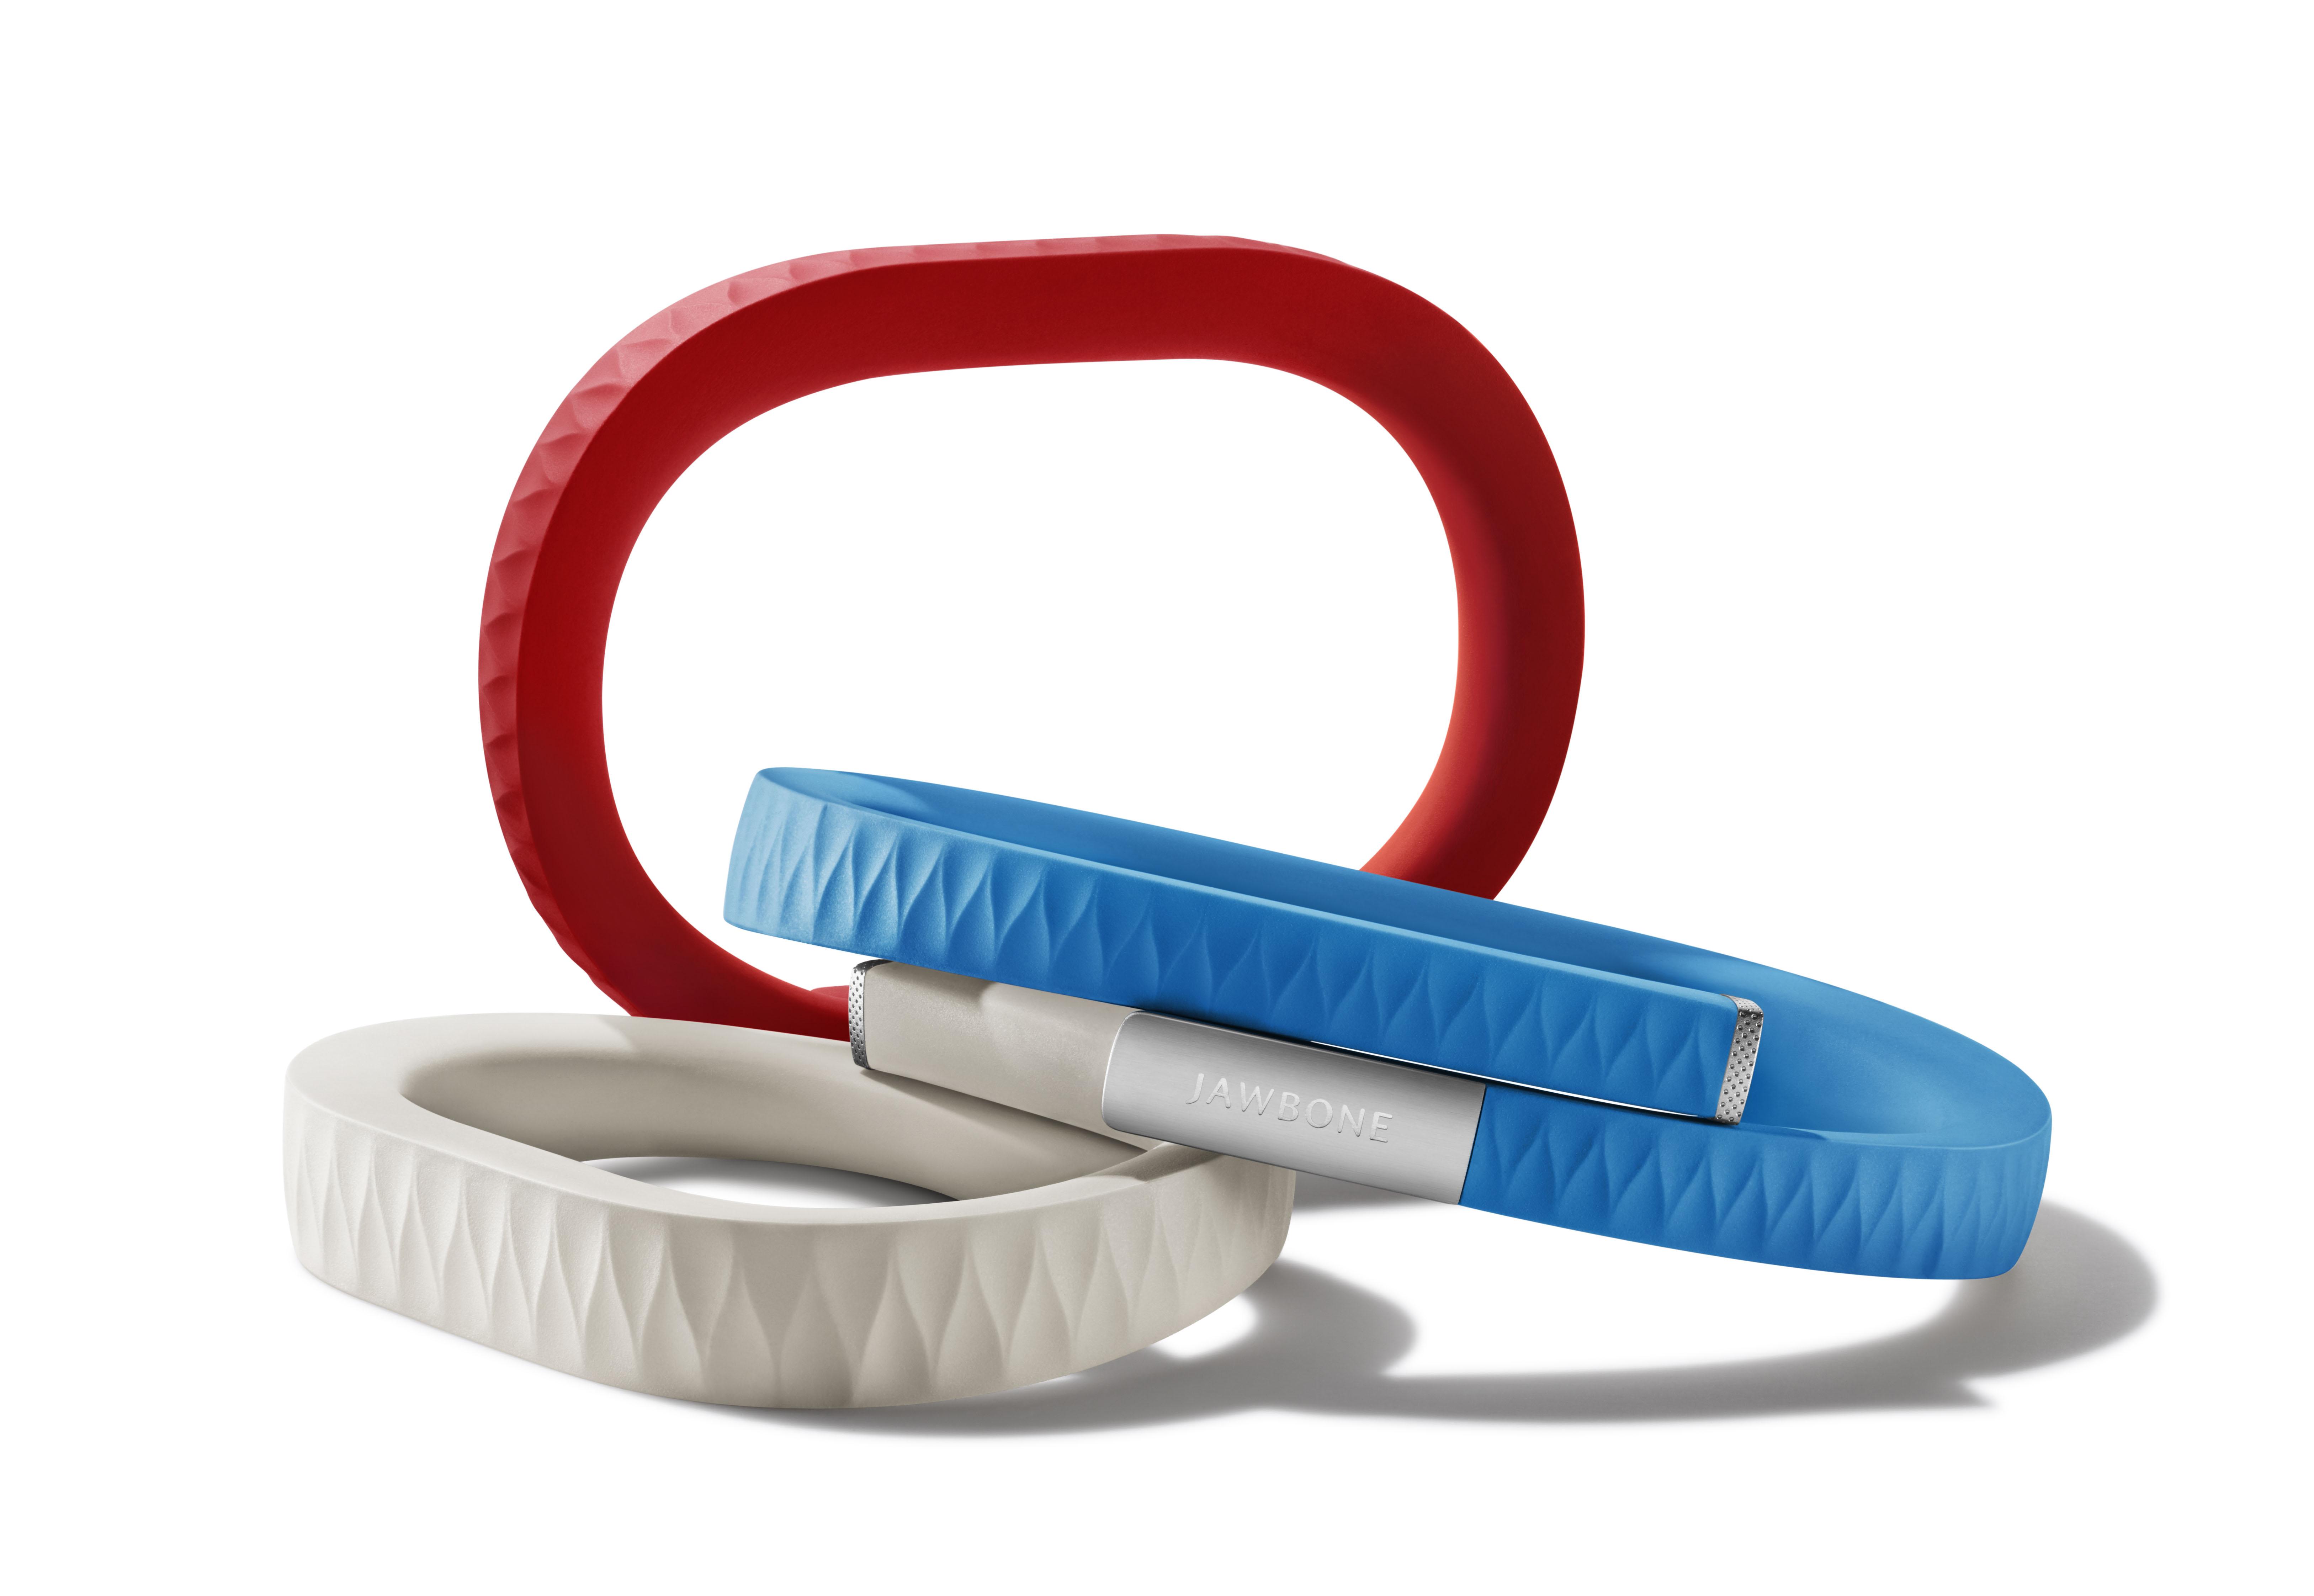 Jawbone UP Fitness Tracker (Large, Onyx) JBR52B-LG-US B&H ...   Jawbone